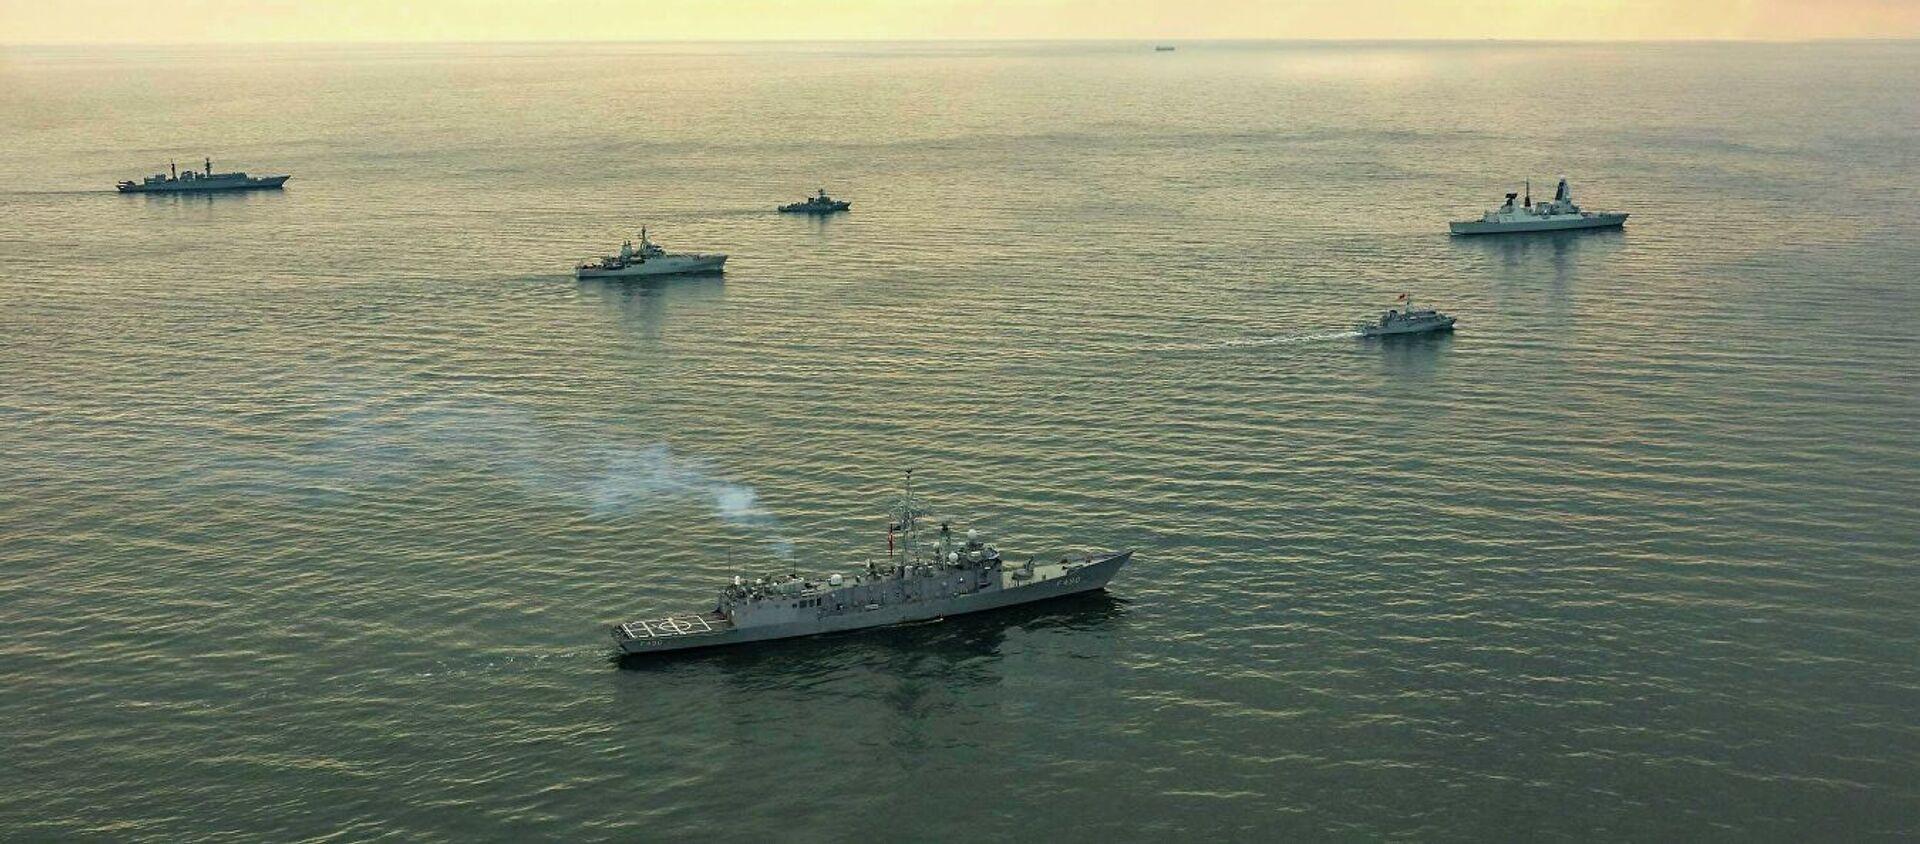 Корабли НАТО в Черном море. Архивное фото - Sputnik Таджикистан, 1920, 19.12.2020